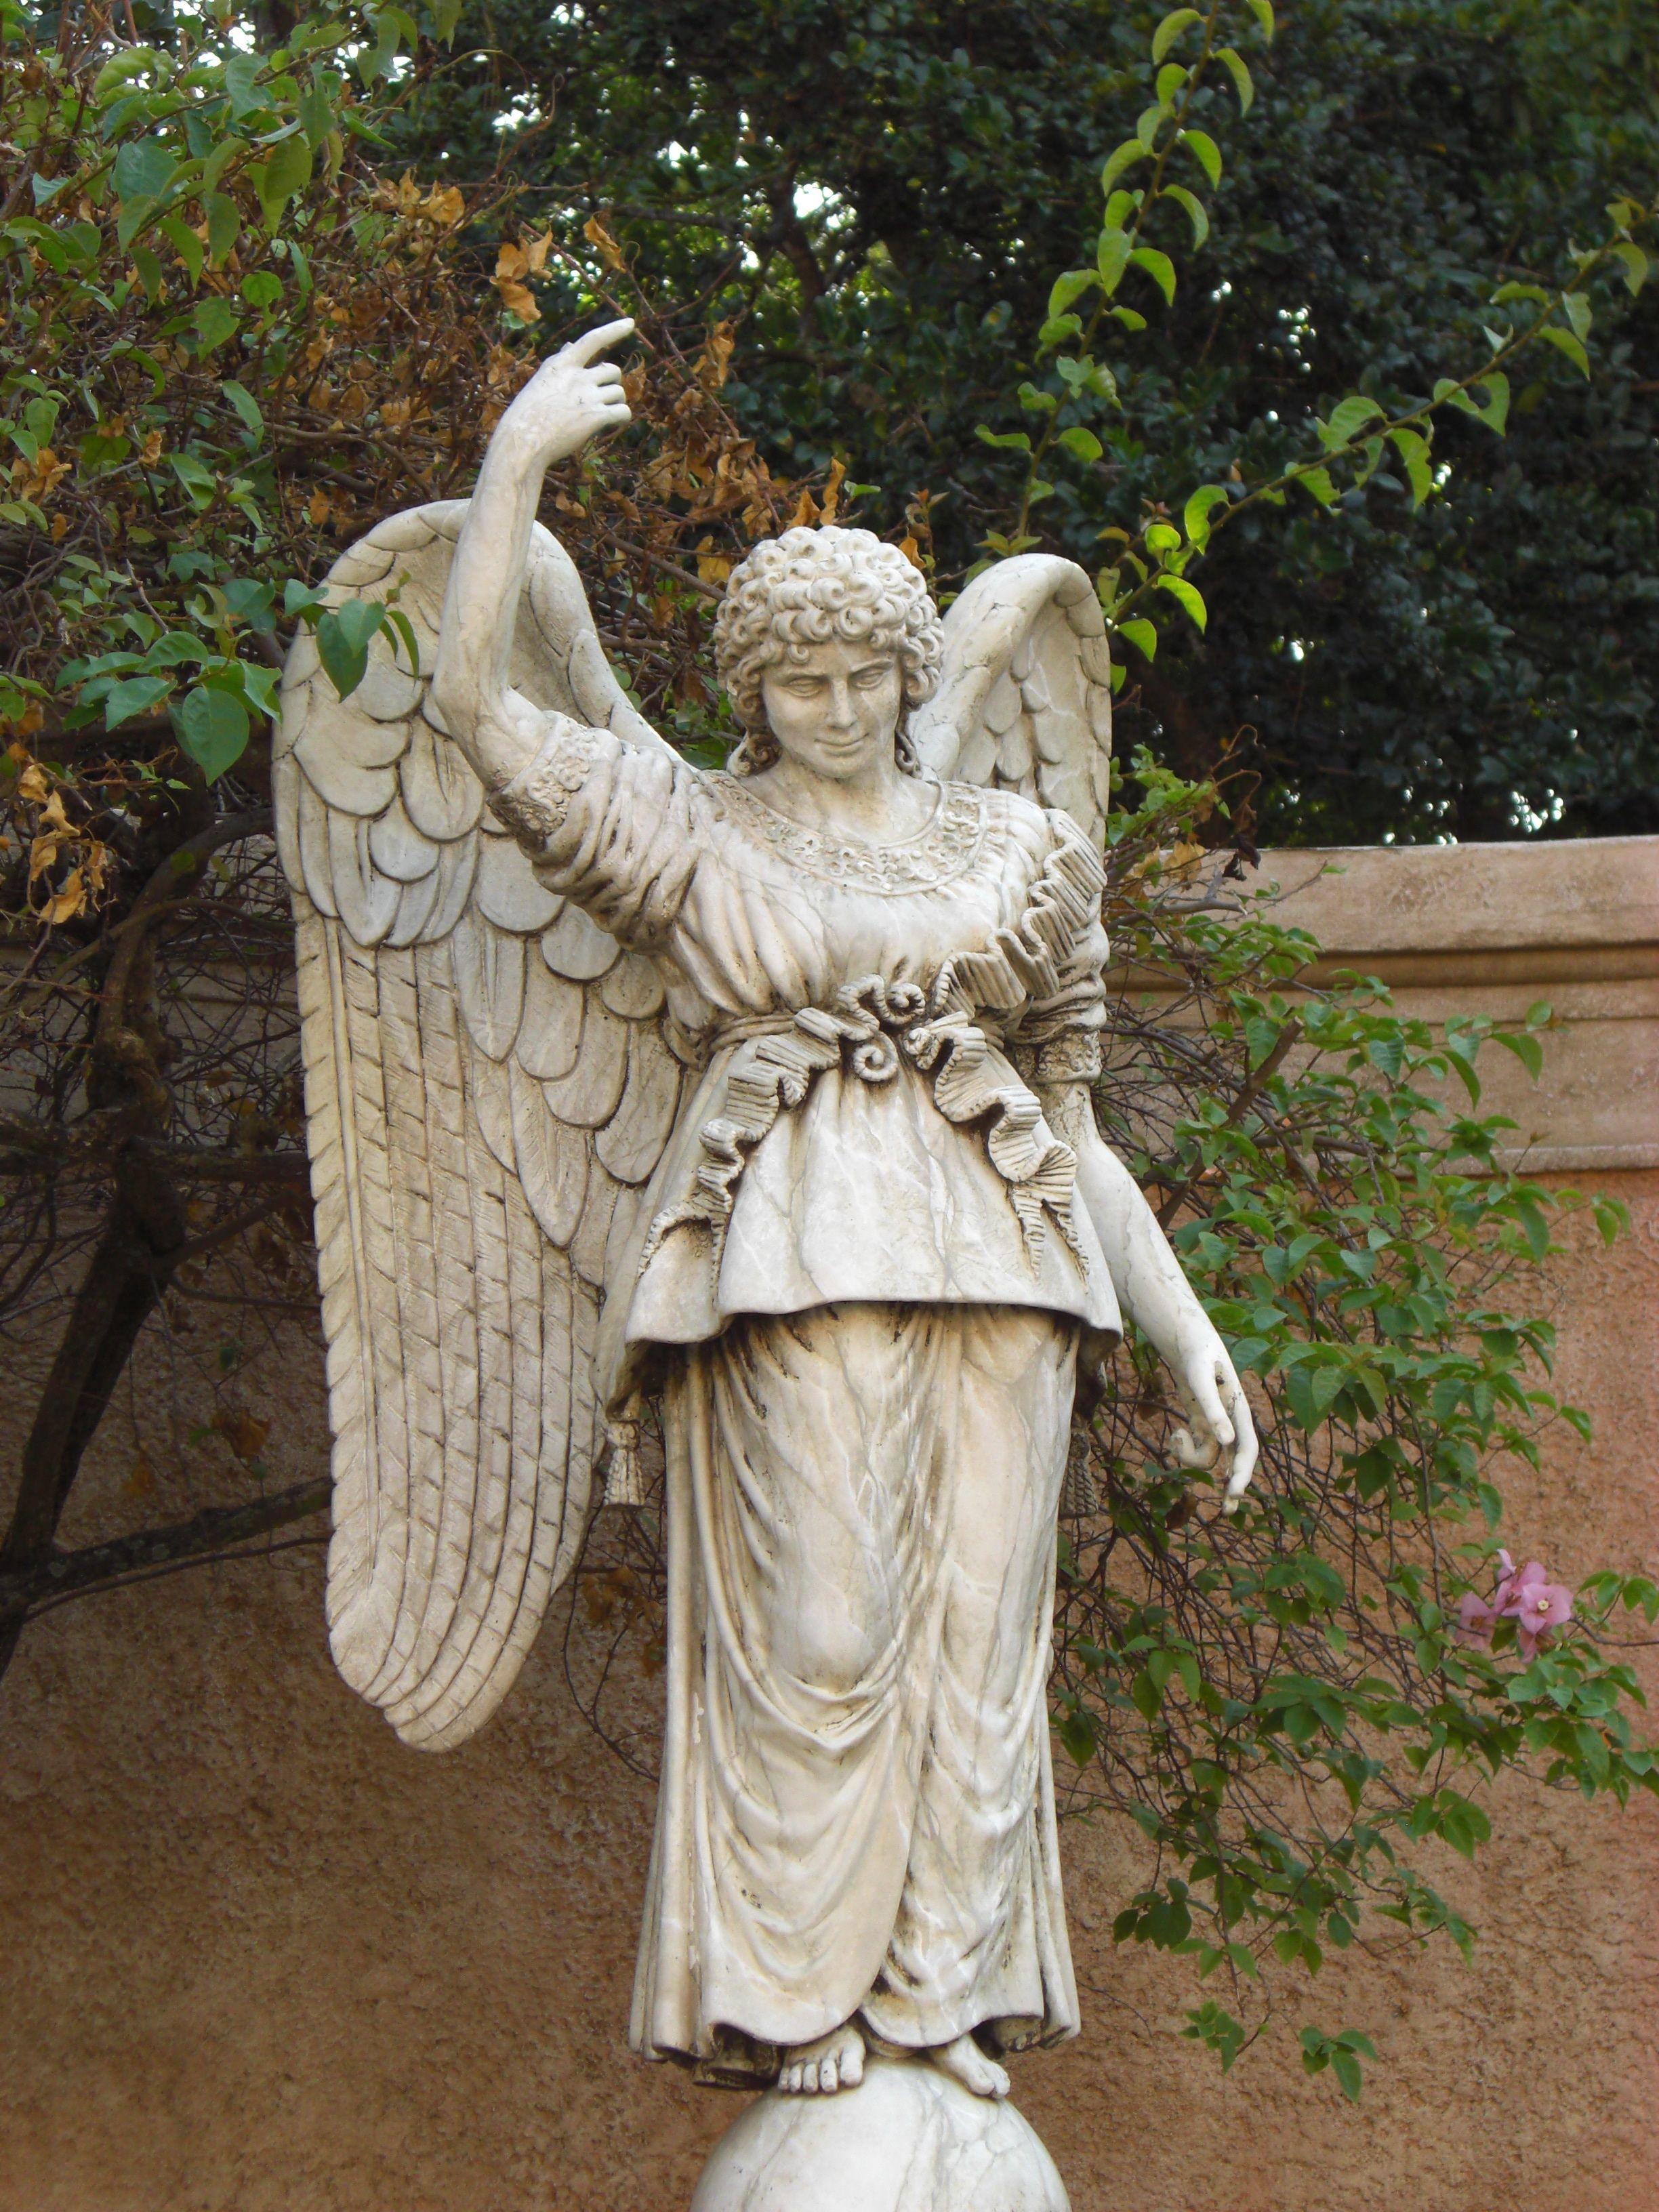 Angel Statue | Angels | Pinterest | Angel statues, Angel and Angel art